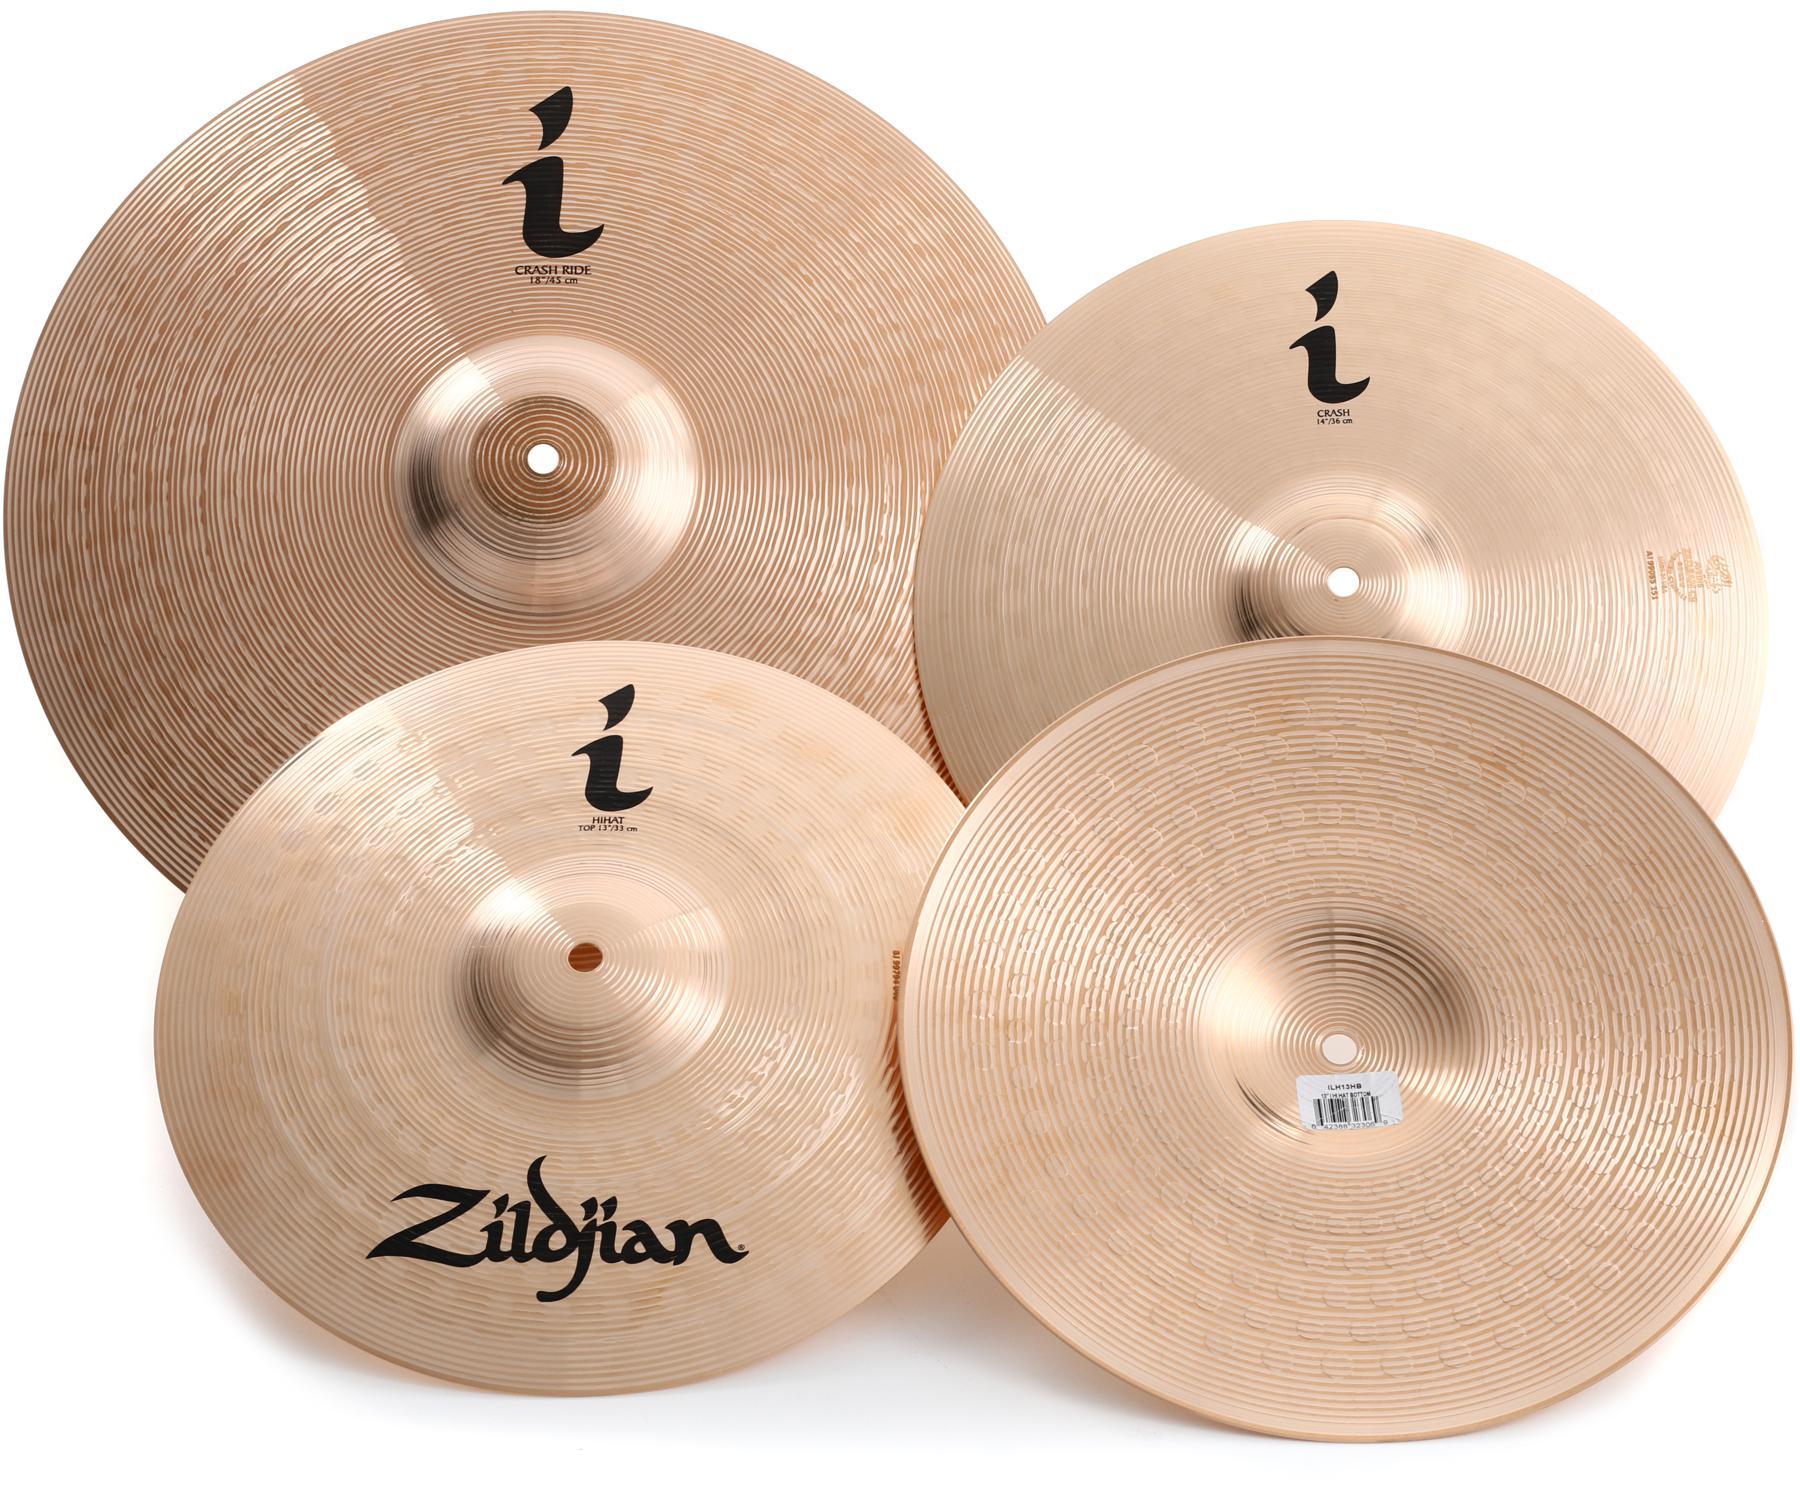 Zildjian I Series Starter Cymbal Pack